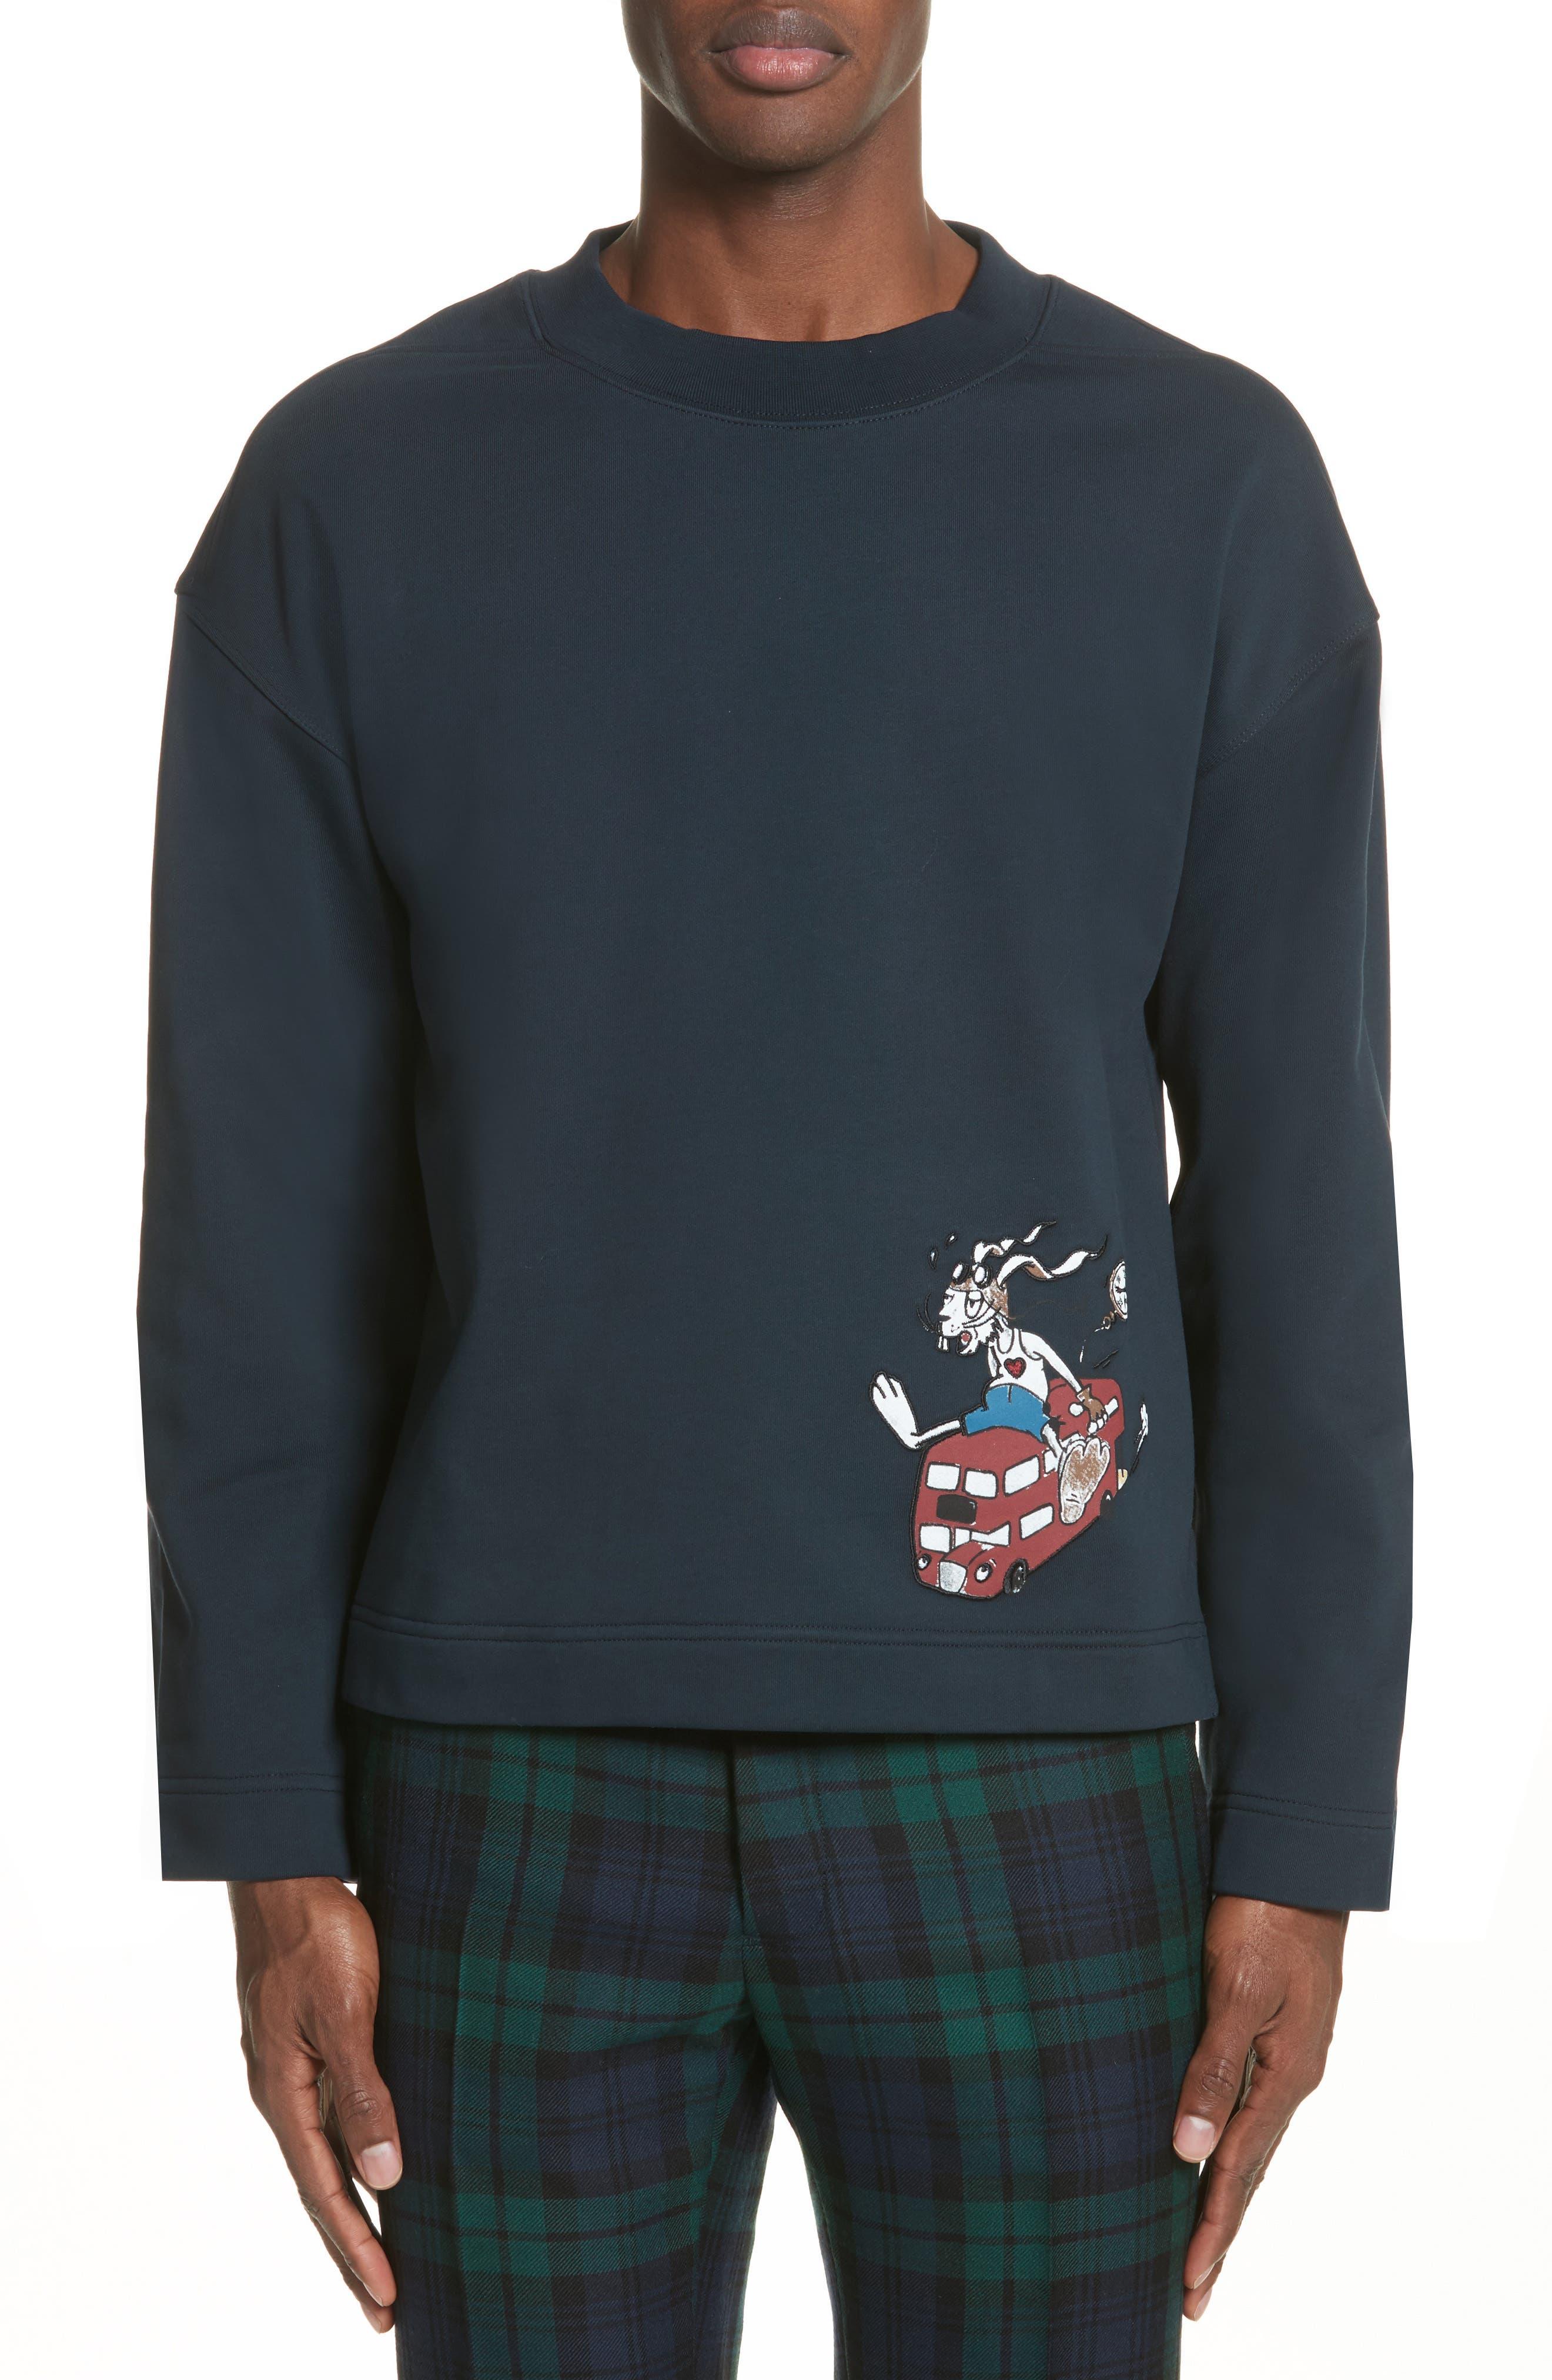 Sketch Print Appliquéd Cropped Sweatshirt,                             Main thumbnail 1, color,                             Navy